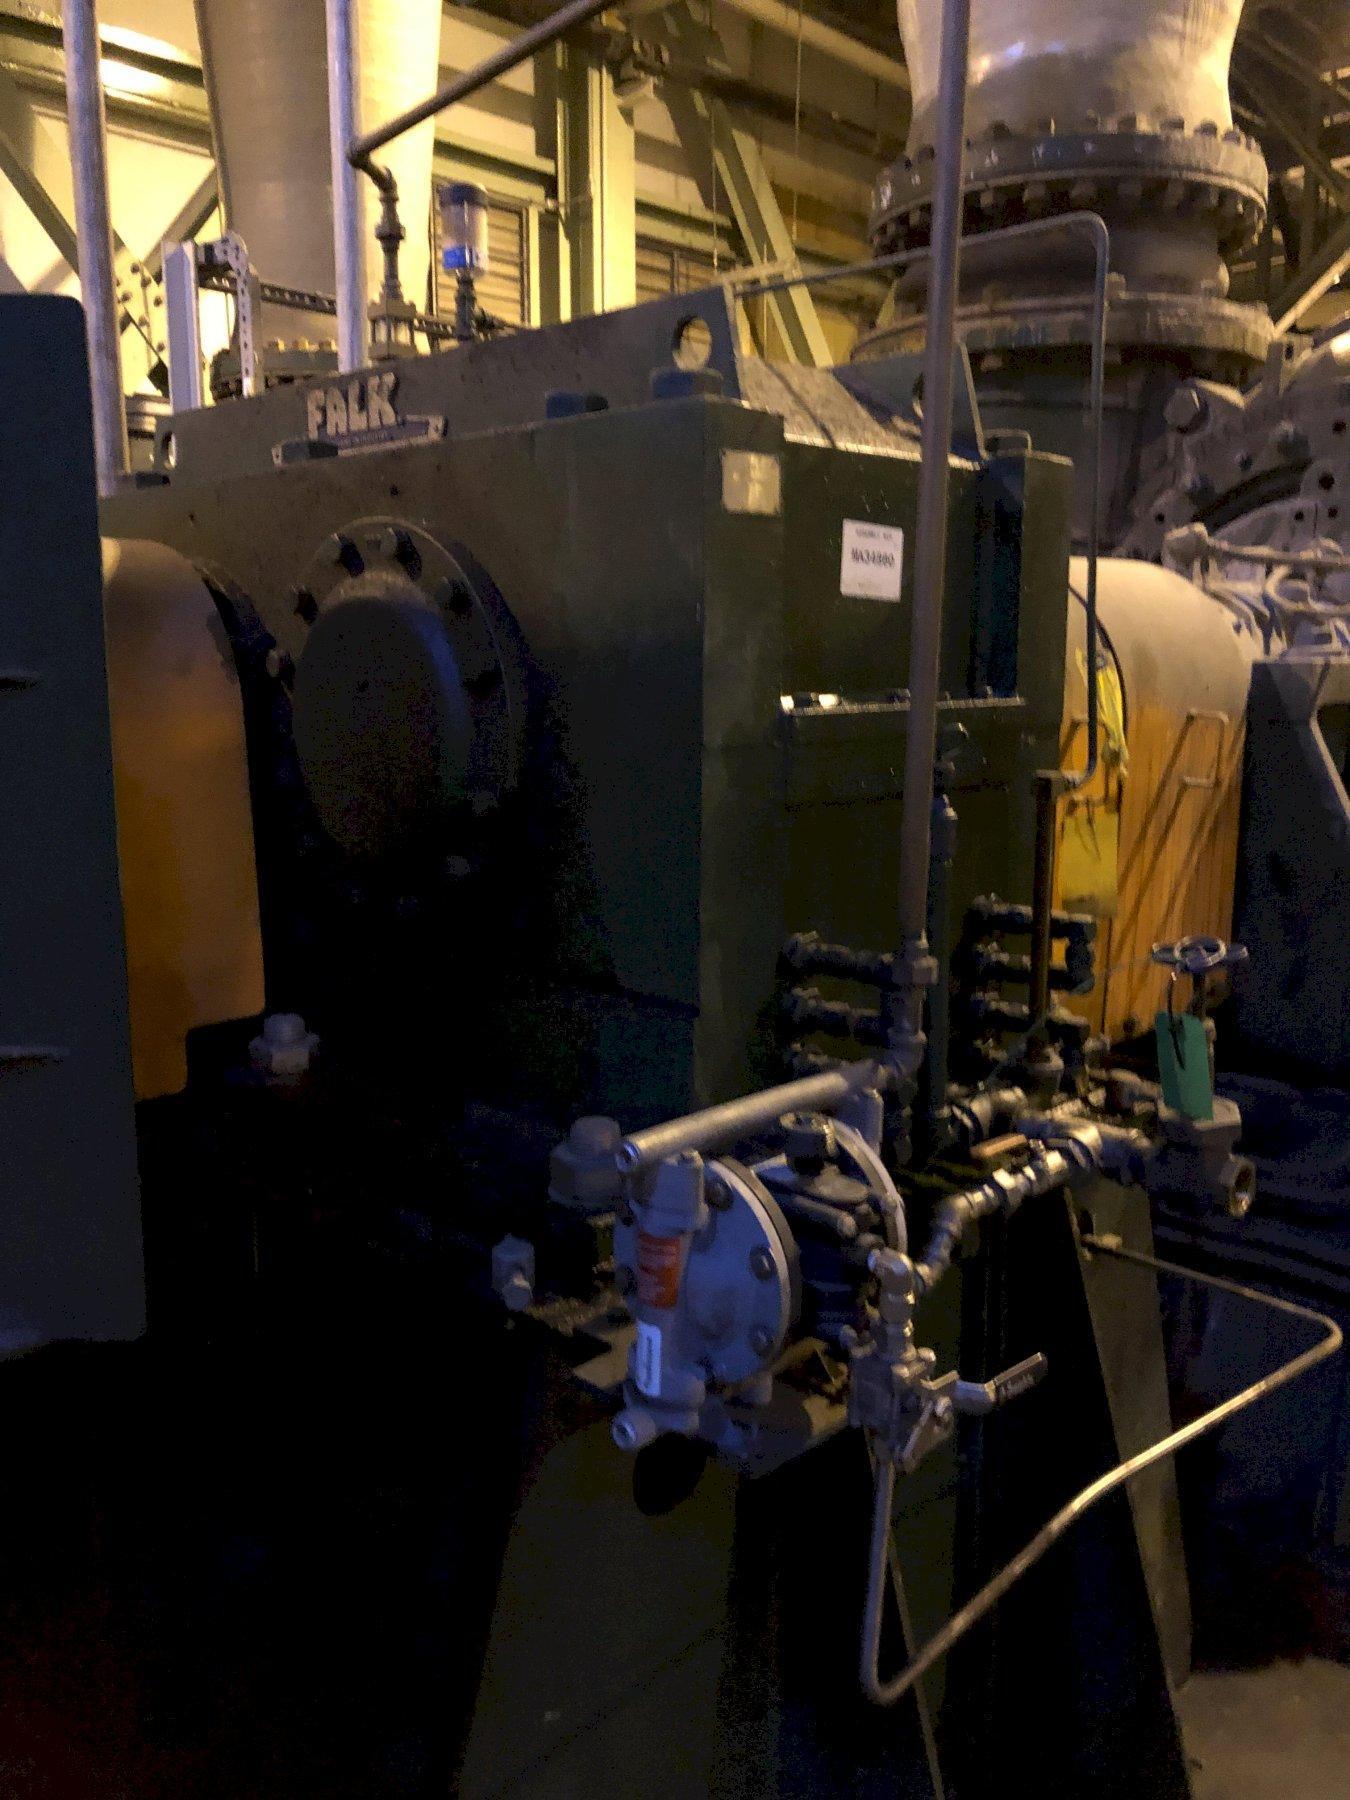 2008 recycle blower system with Siemens 1750 hp motor 6600 volt s/n 079172?020-1, Falk dolrs-gear-ooo2b gearbox, Harman 800gsl blower model 80tycslraamm163 s/n mds299917m